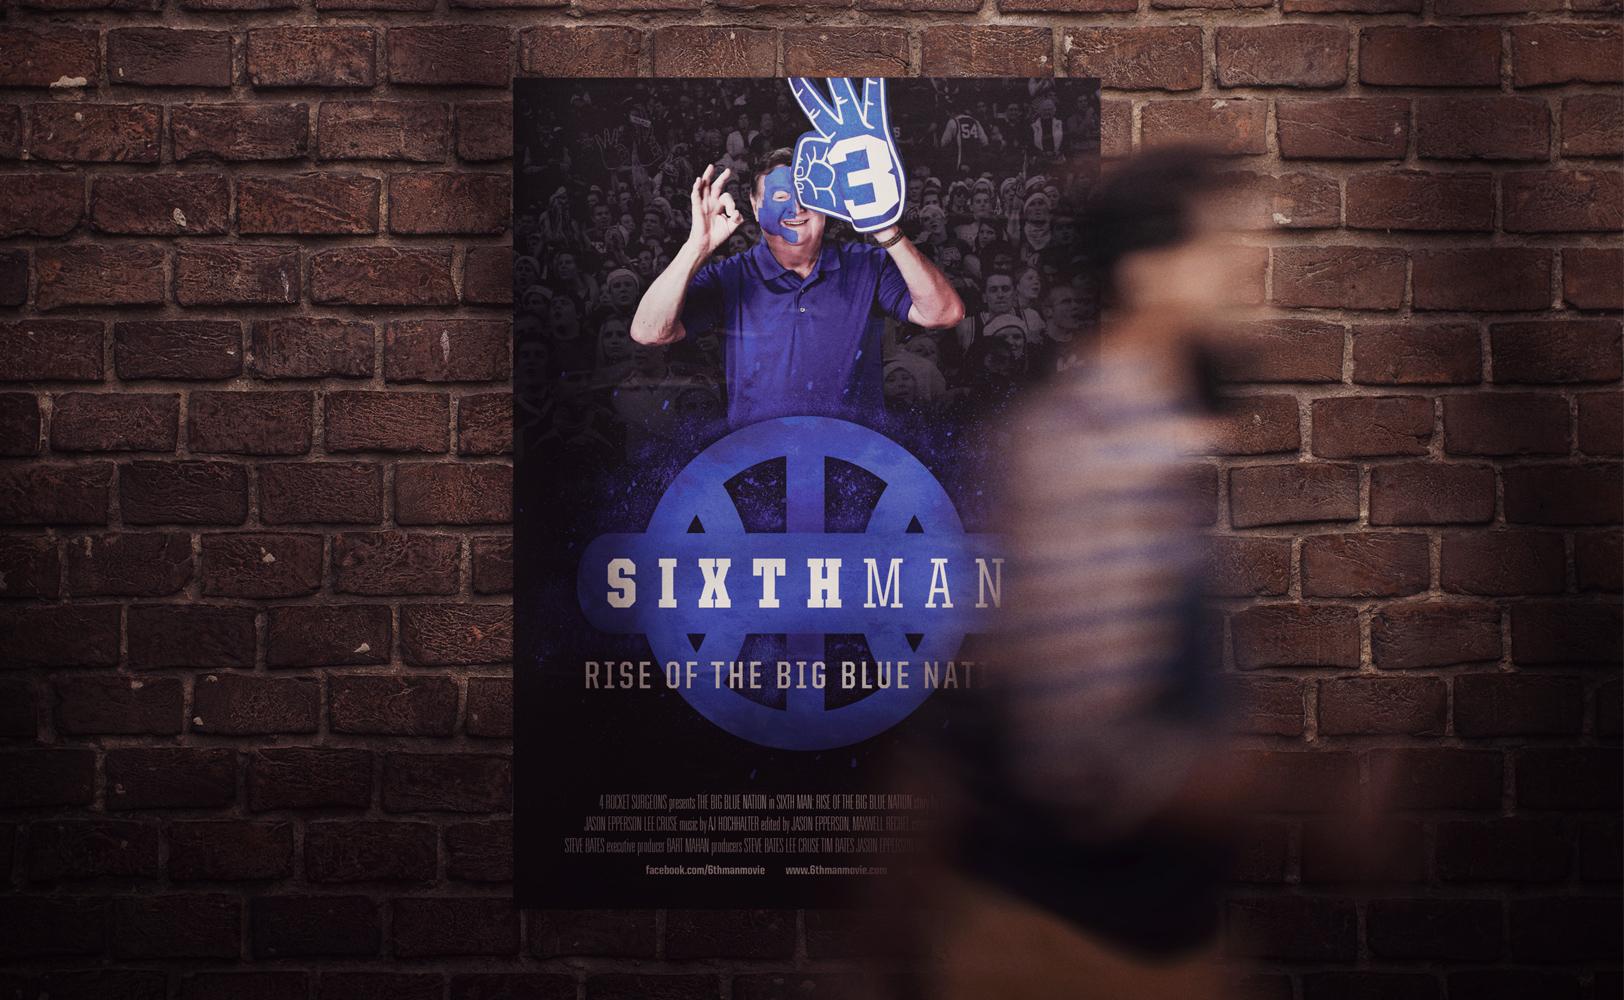 Sports design of The Sixth Man documentary Joe B. Hall film poster